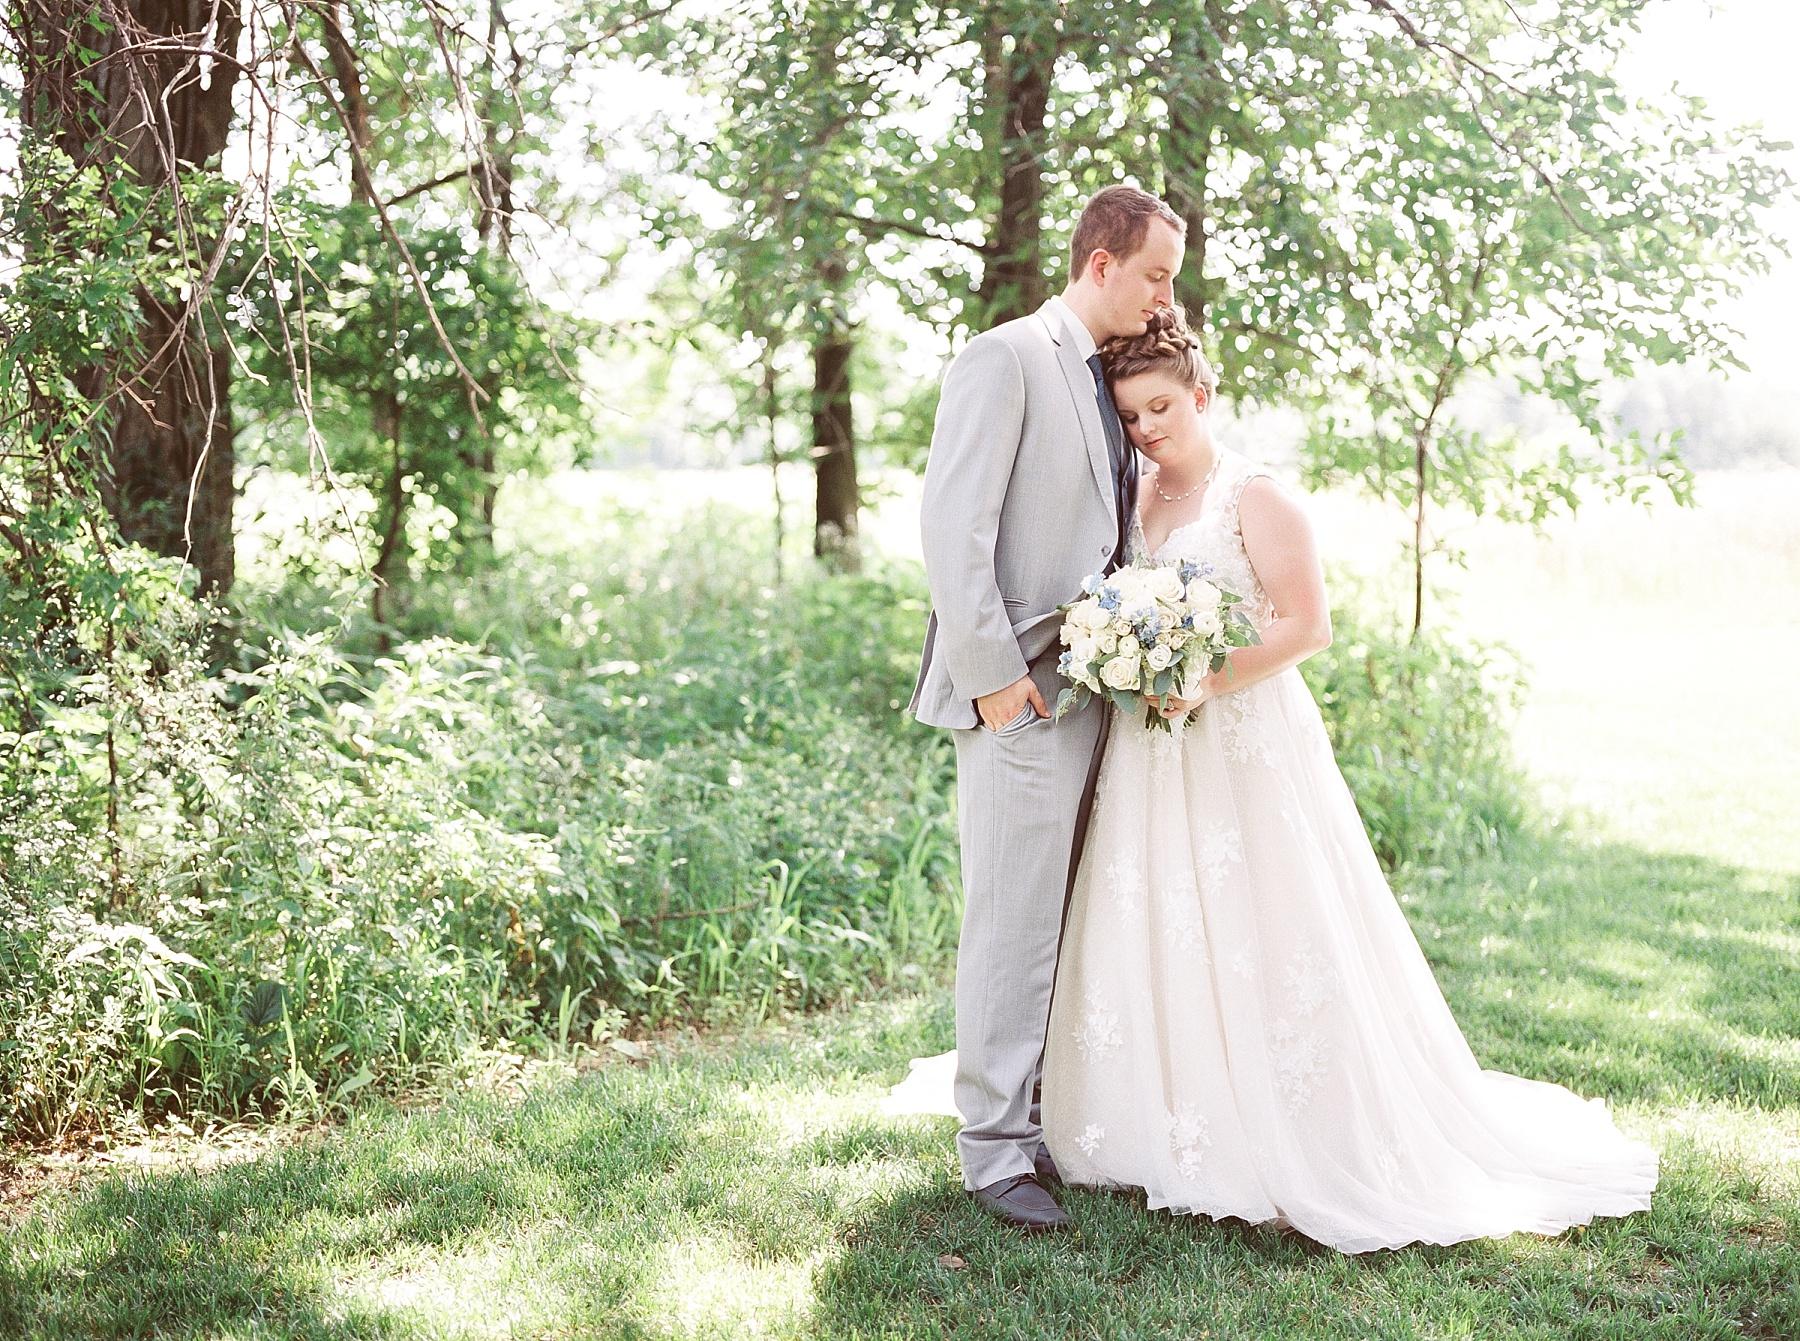 Intimate Summer Wedding at Emerson Fields by Kelsi Kliethermes Photography Best Missouri and Maui Wedding Photographer_0016.jpg